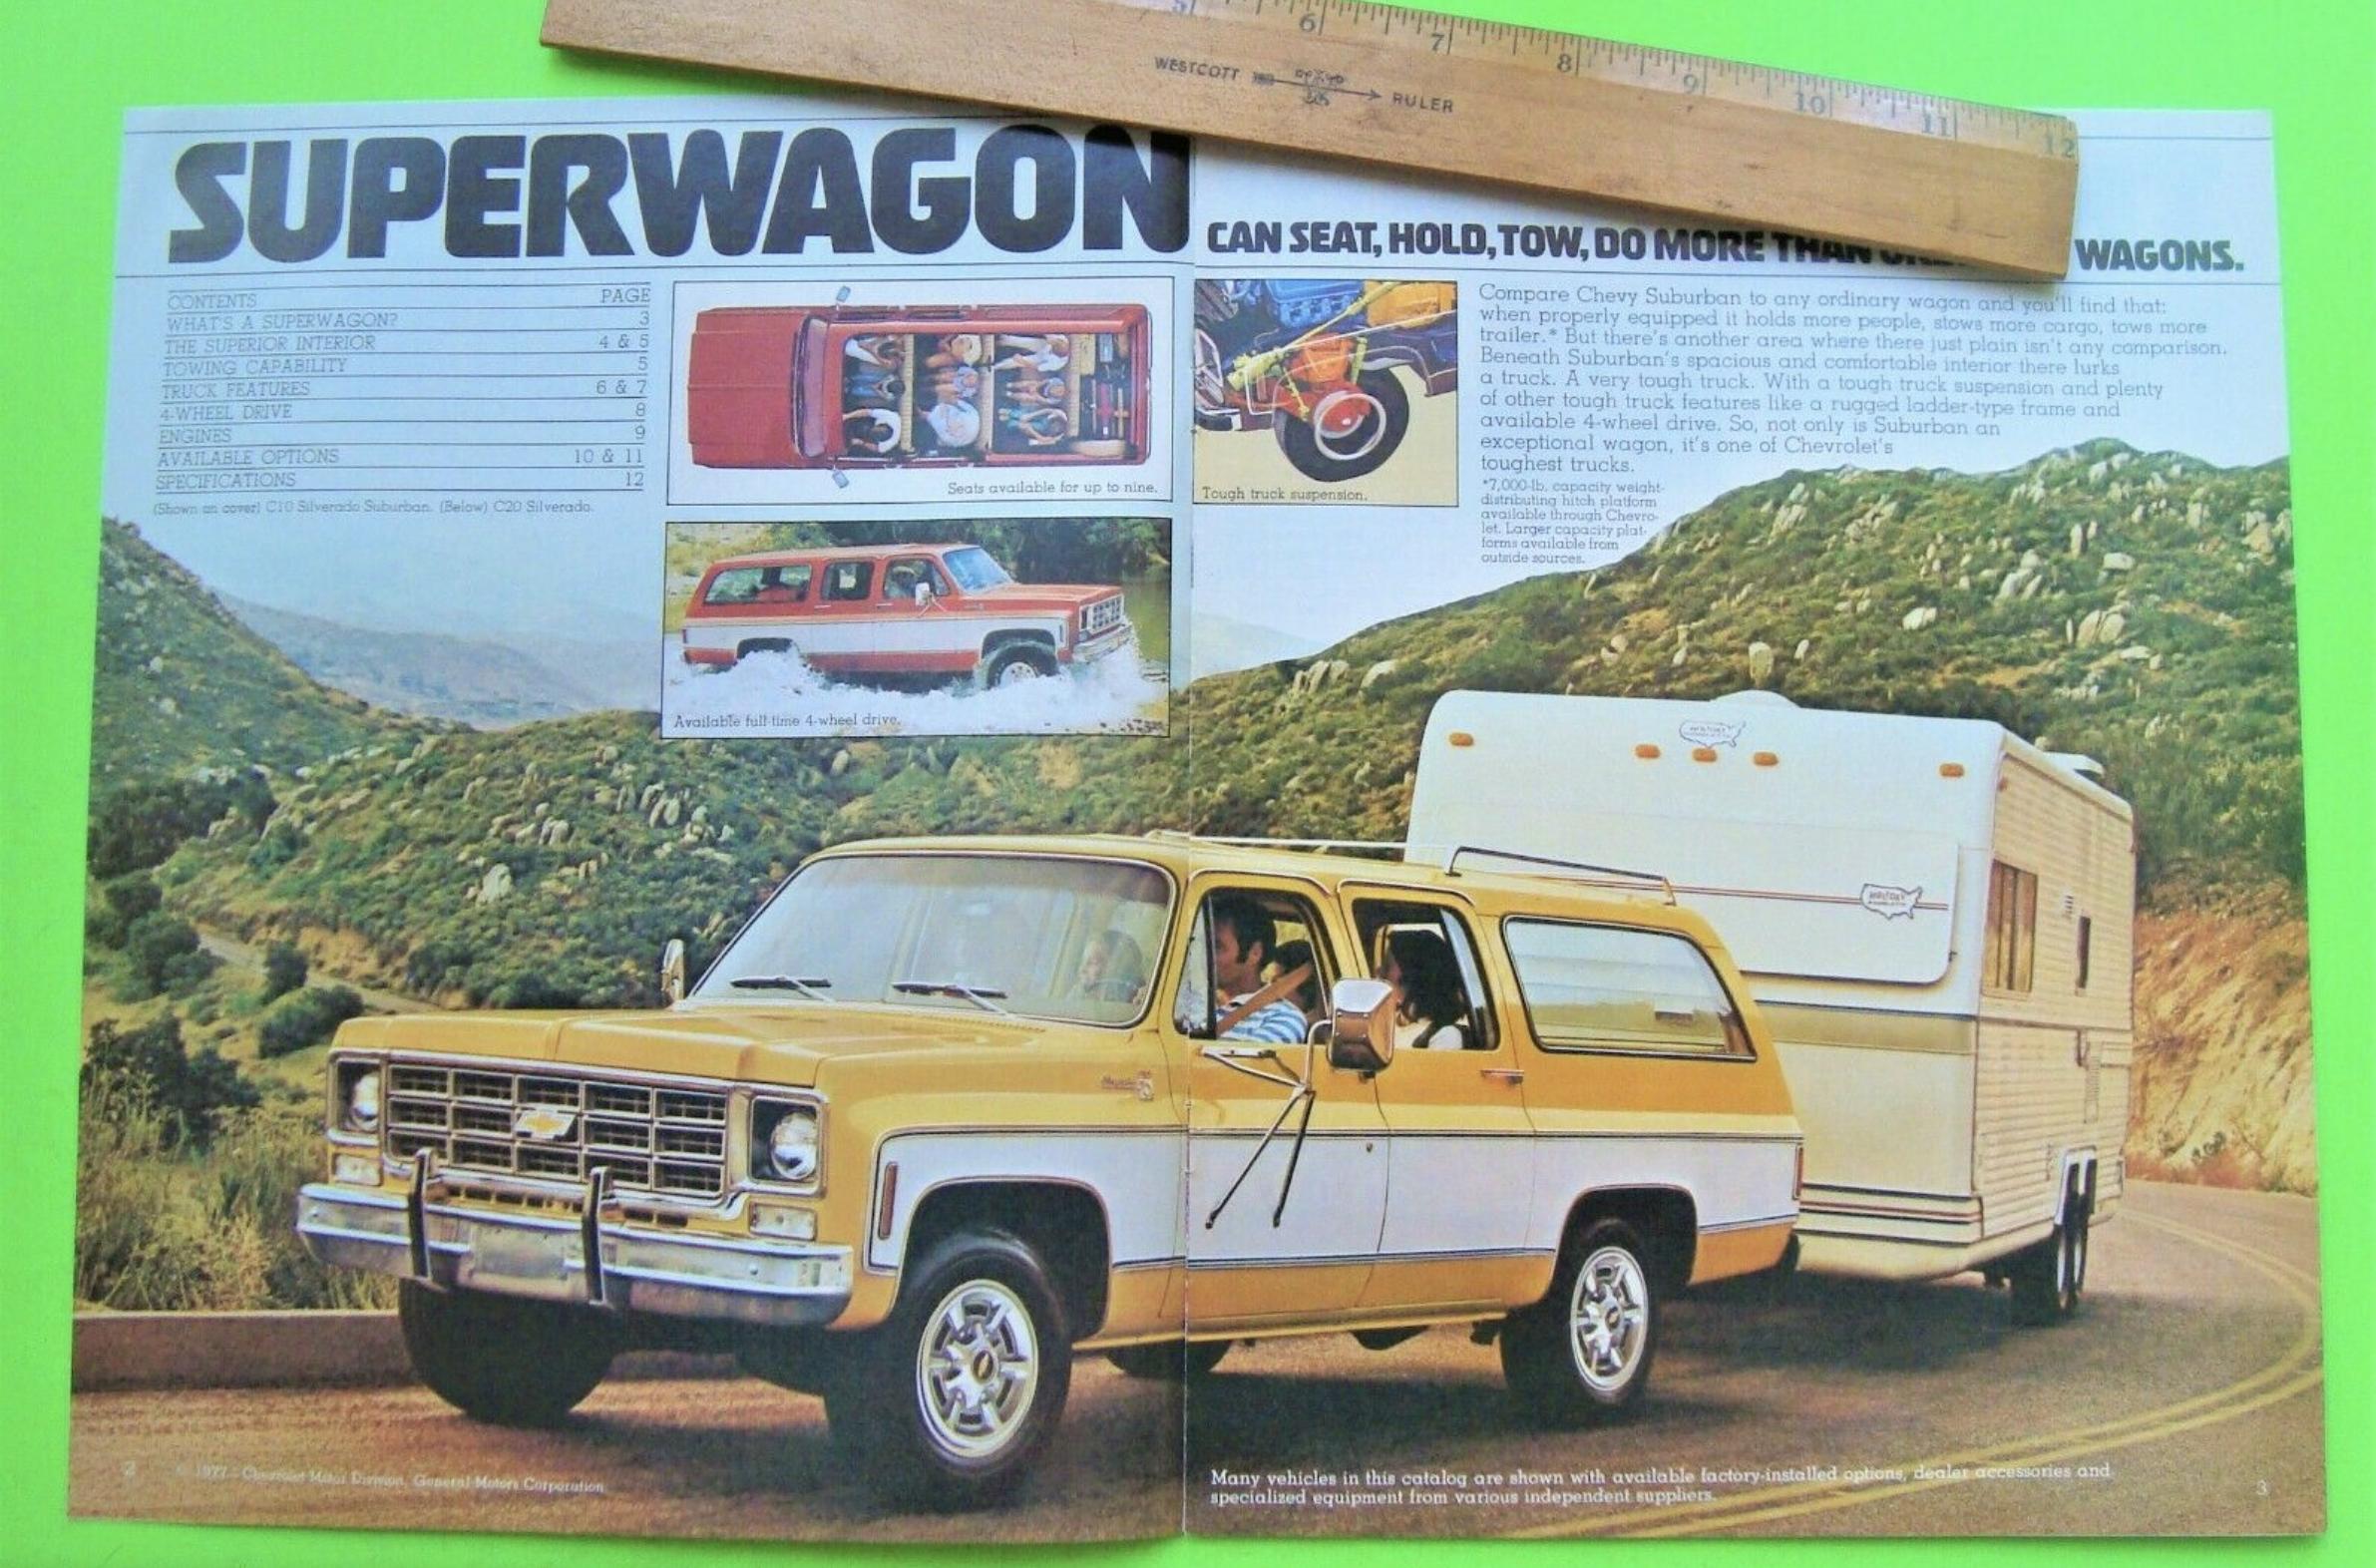 1977 Chevrolet Suburban ad superwagon